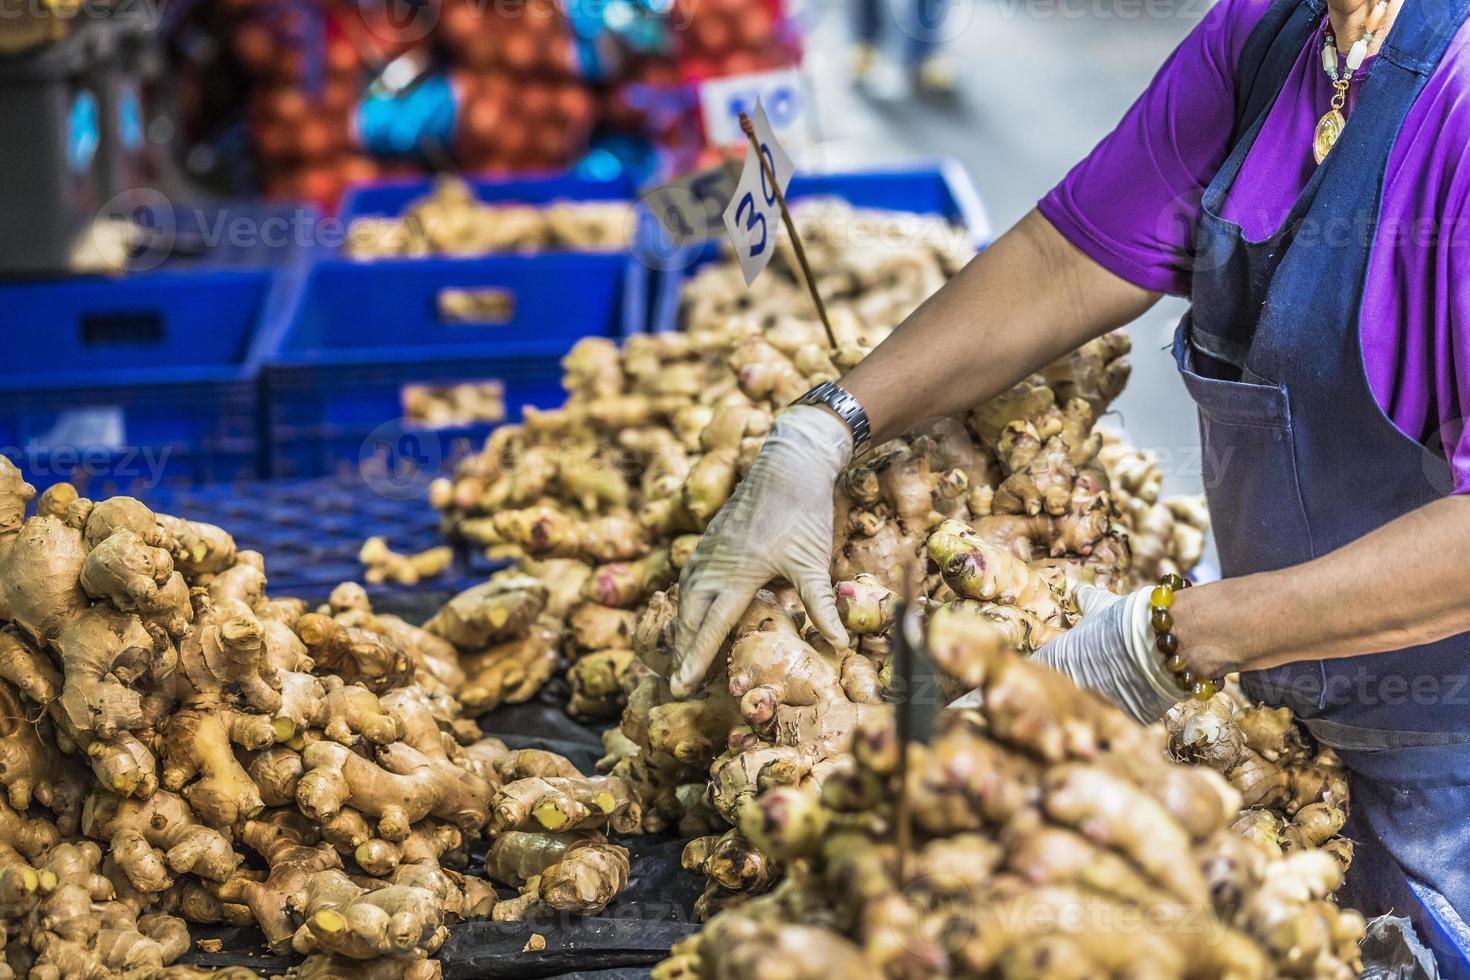 mercato a bangkok, thailandia. foto